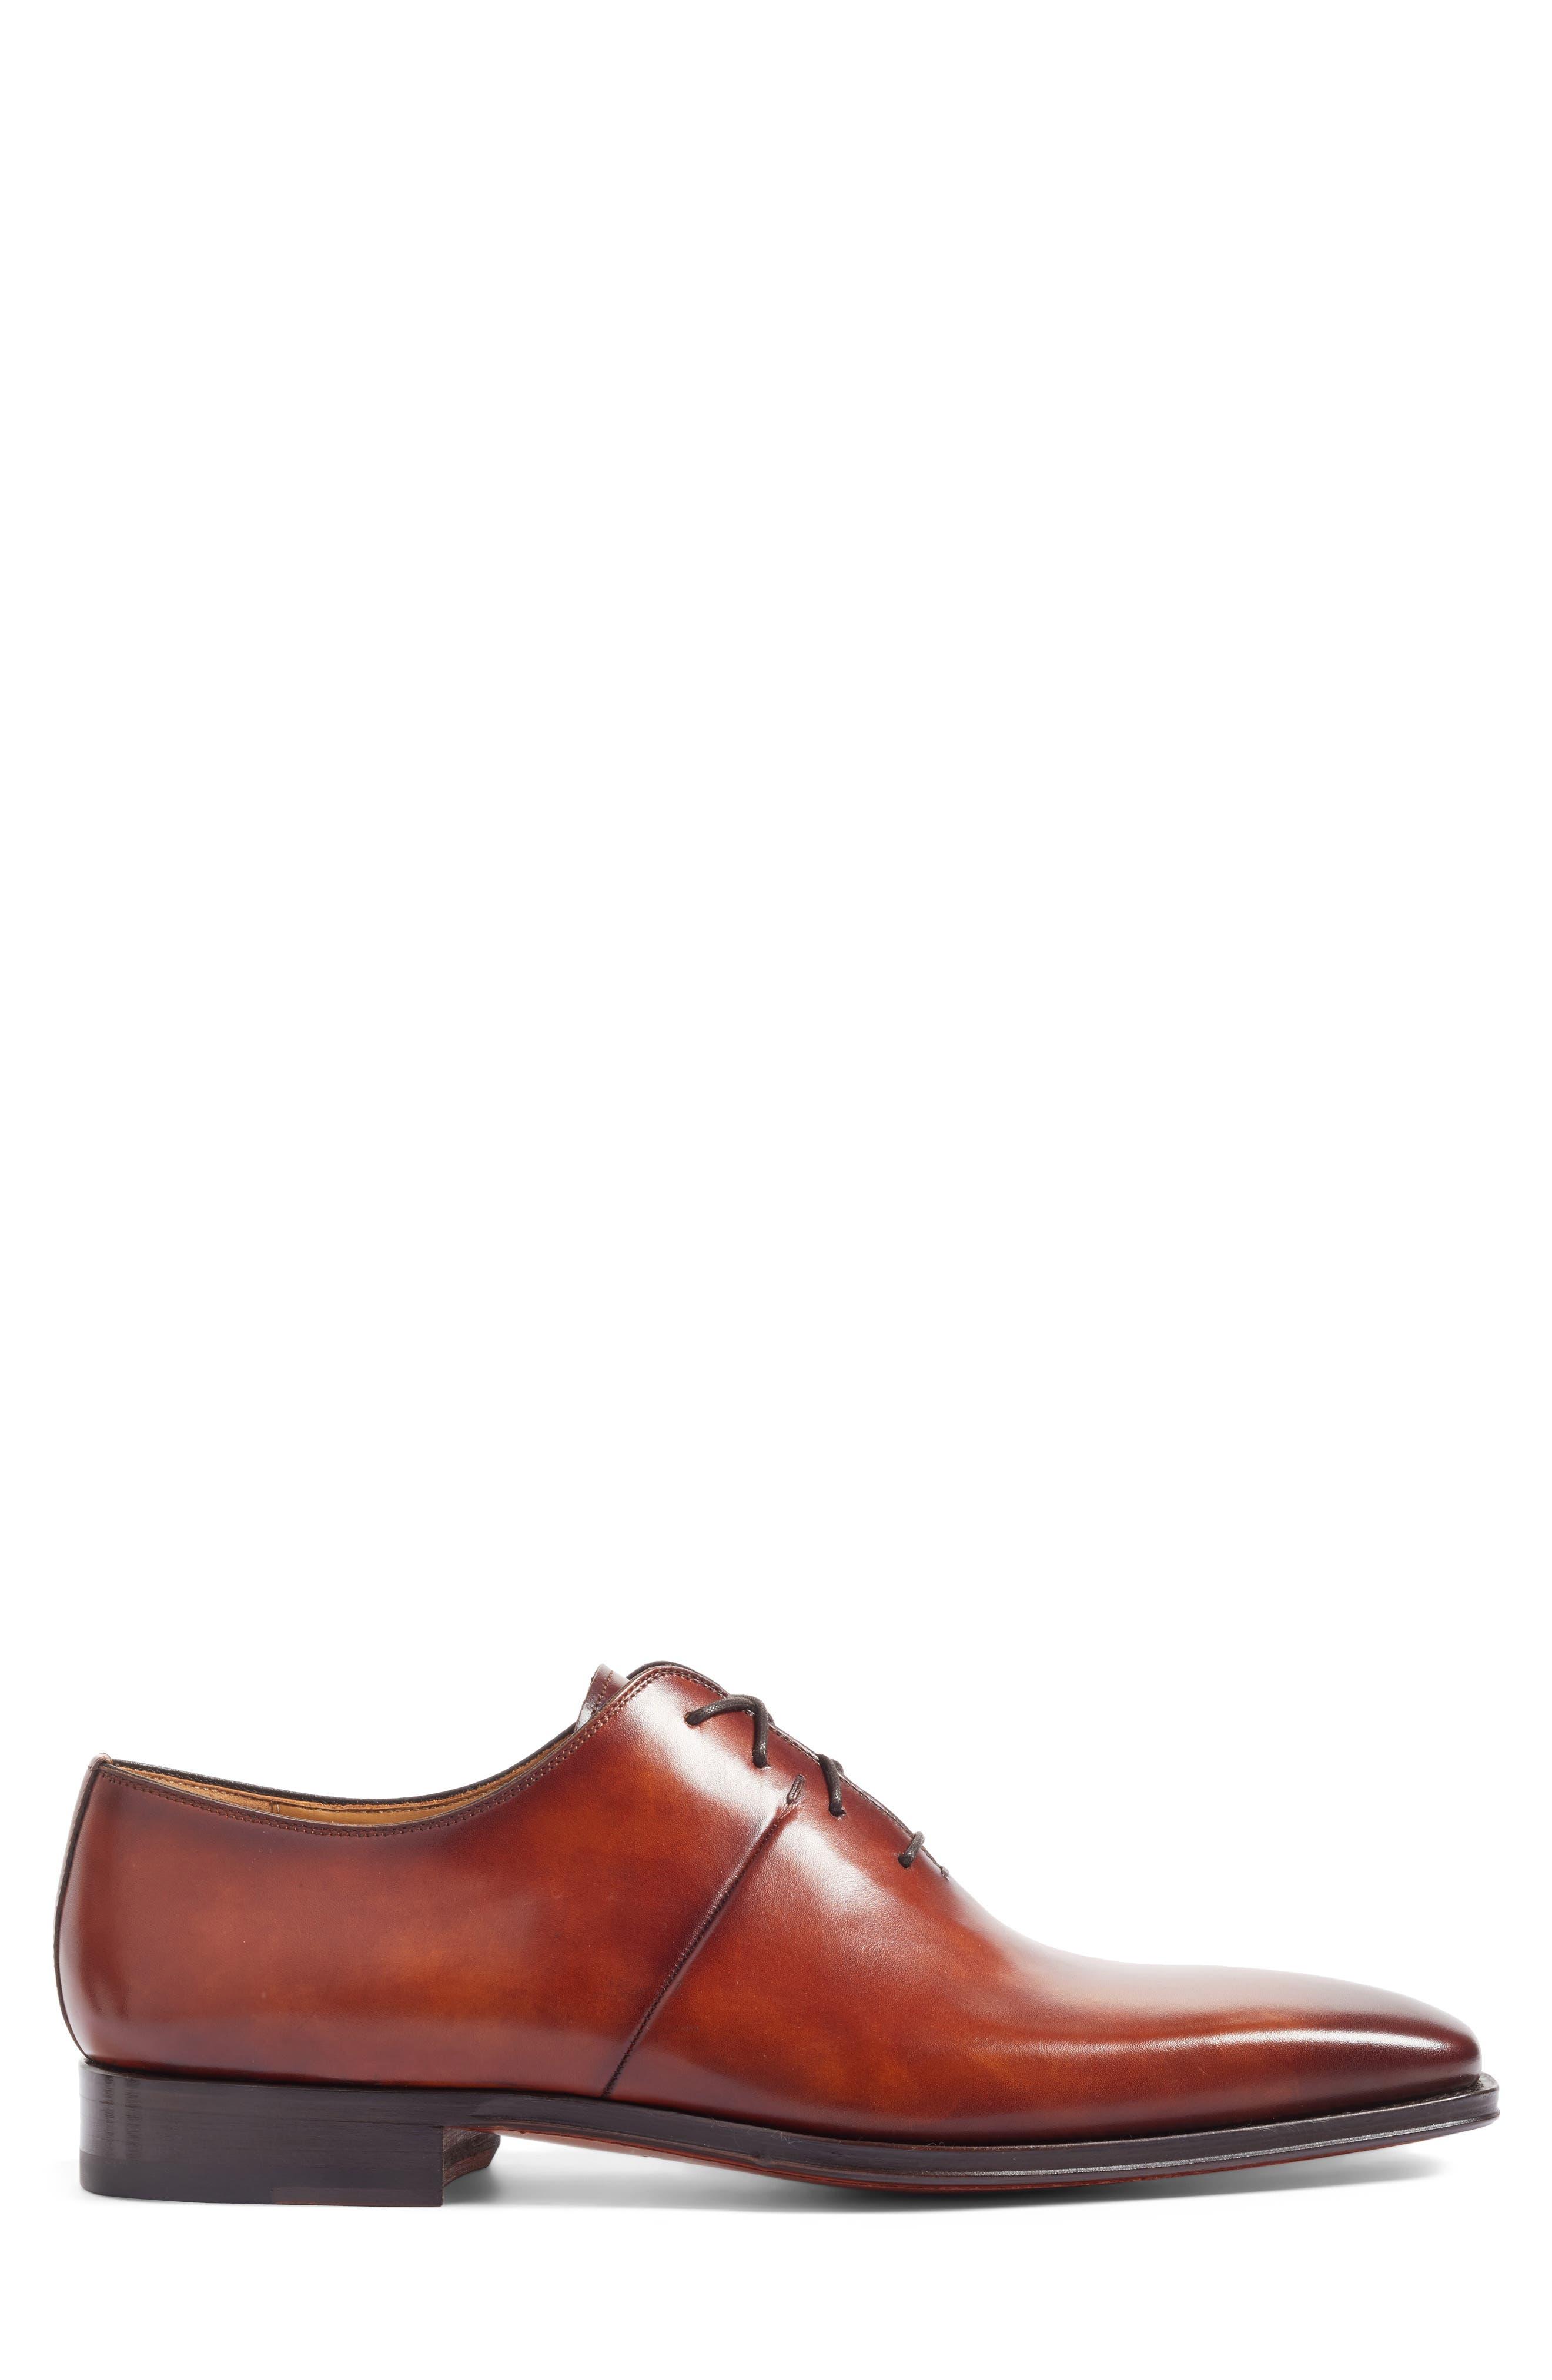 Cornado Plain Toe Oxford,                             Alternate thumbnail 3, color,                             Cognac Leather